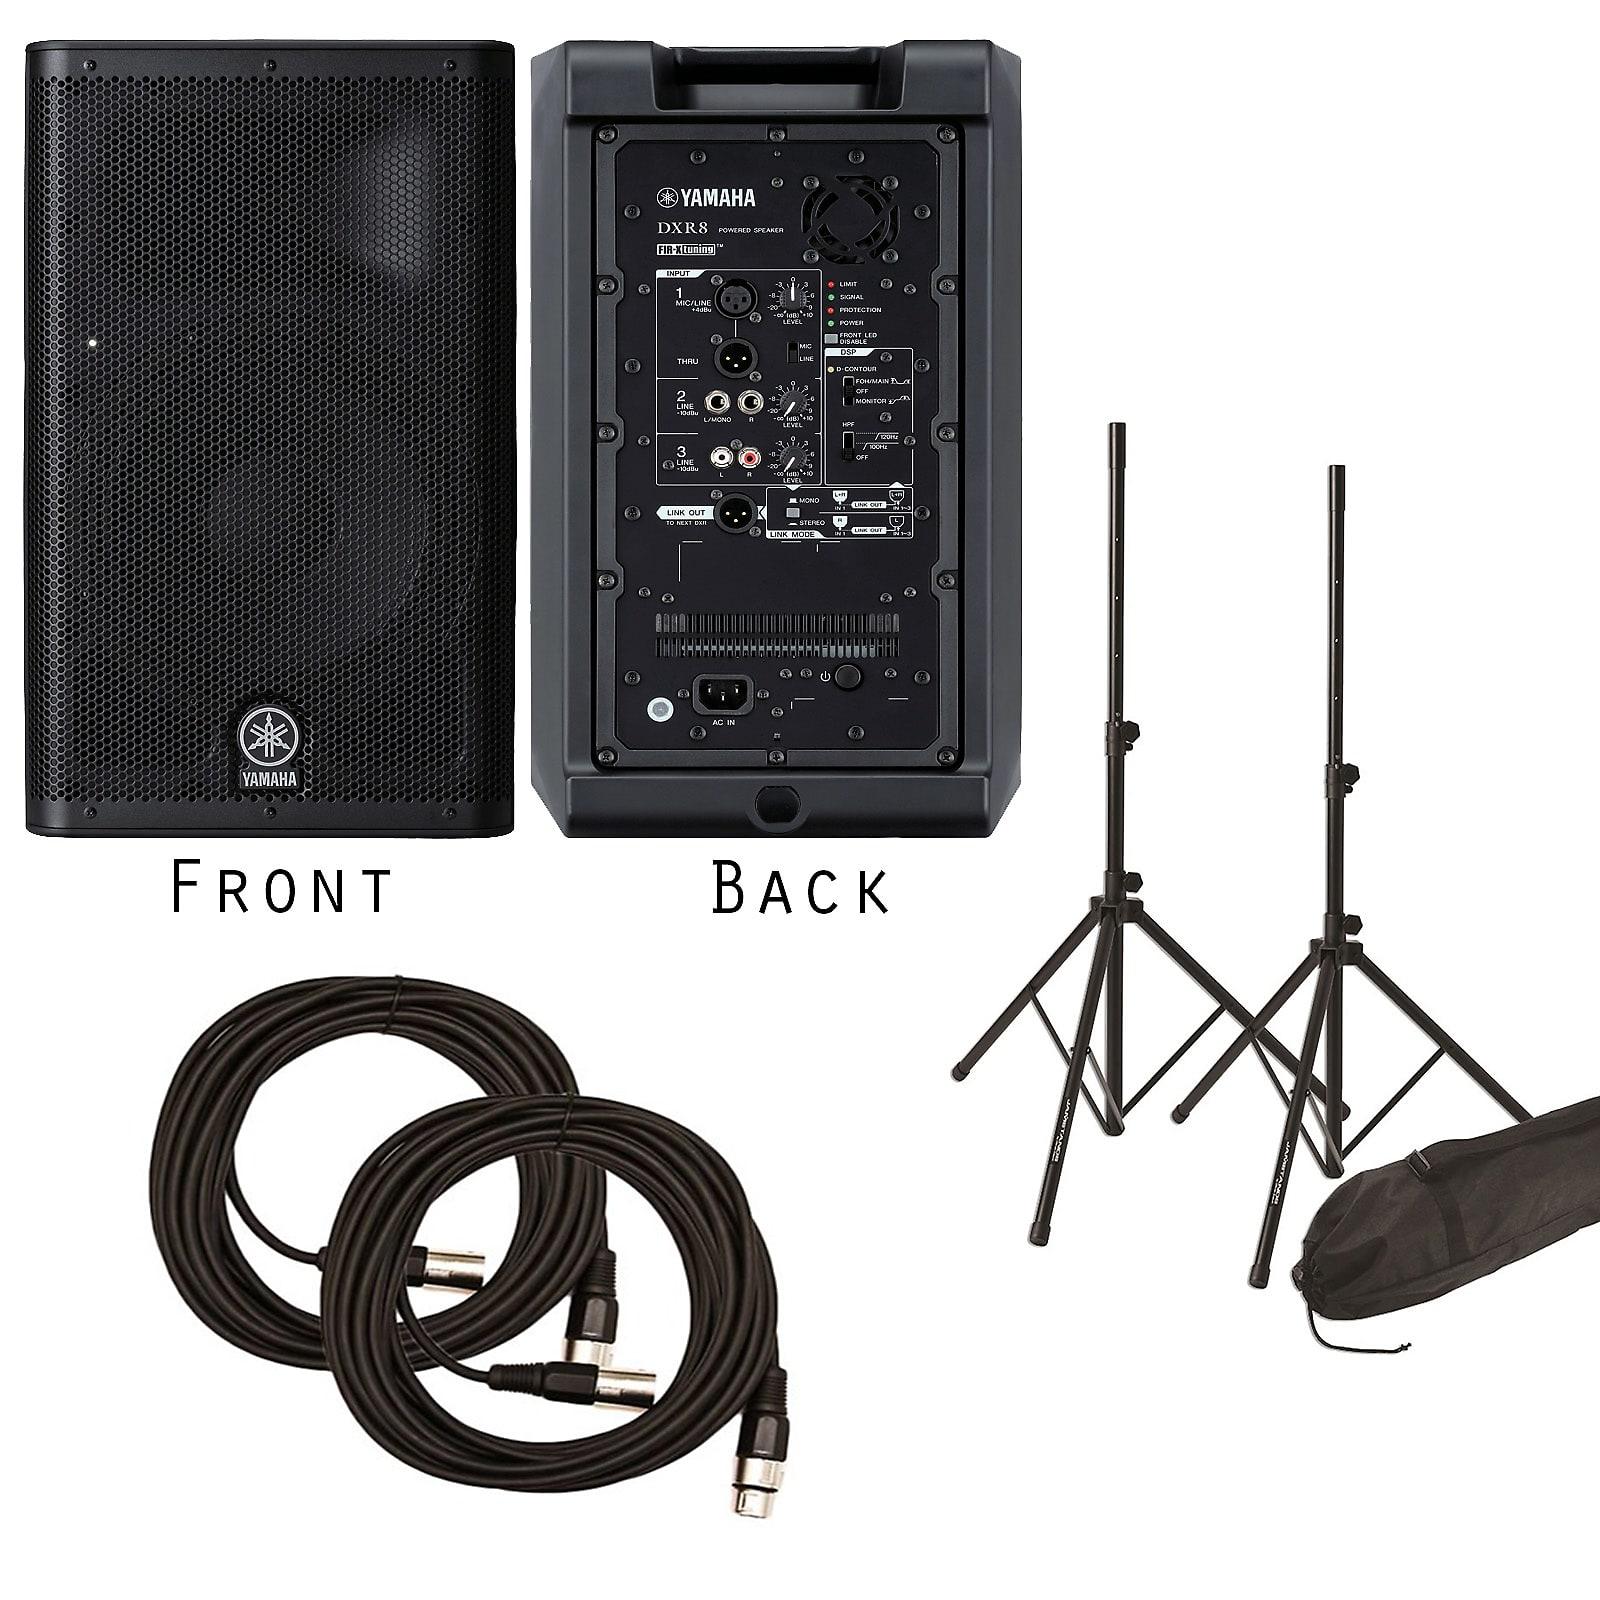 Pair! Yamaha DXR8 1100 Watt Powered Speakers for Live Church Sound w/ FREE  Speakers Stands & XLR